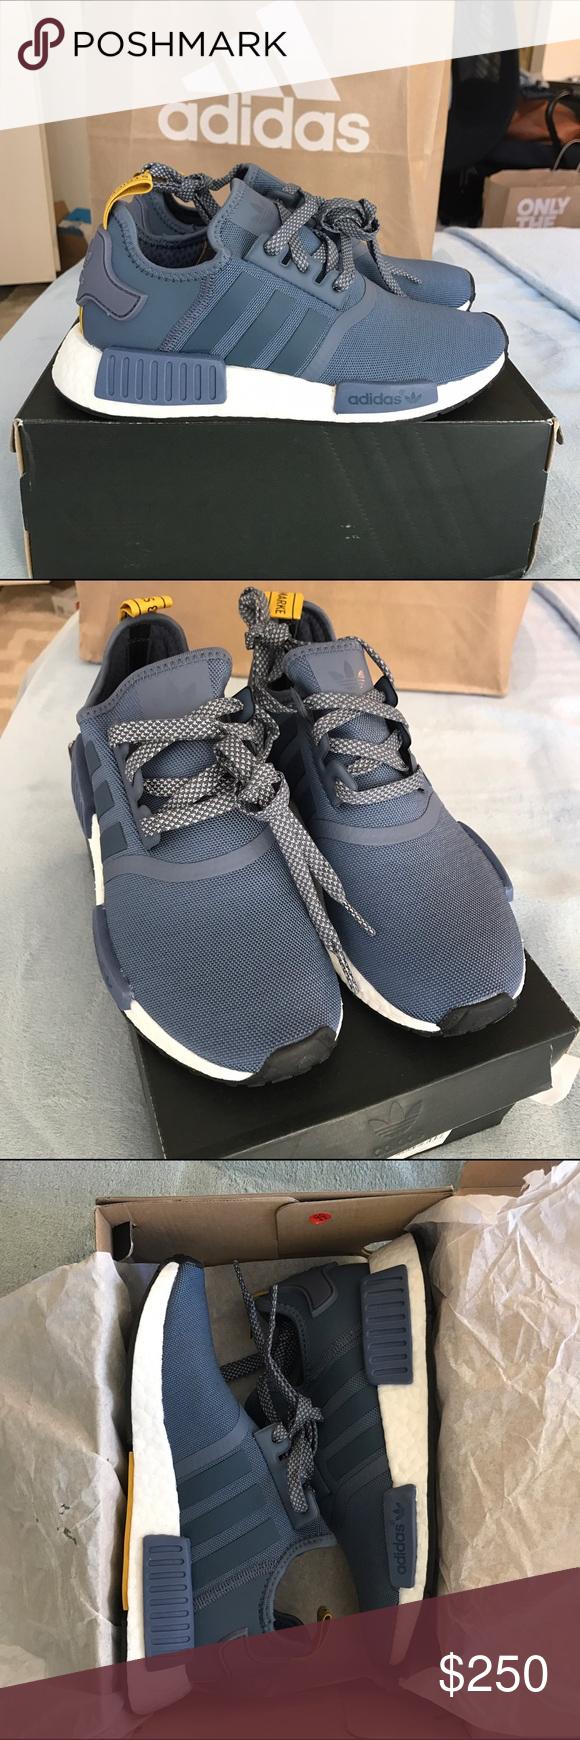 adidas NMD R1 Blue Women s Size 6 Adidas Originals NMD R1 Shoes Men s Size 5    Women s Size 6 Fits like a Women s 6.5 Deadstock fececcd74